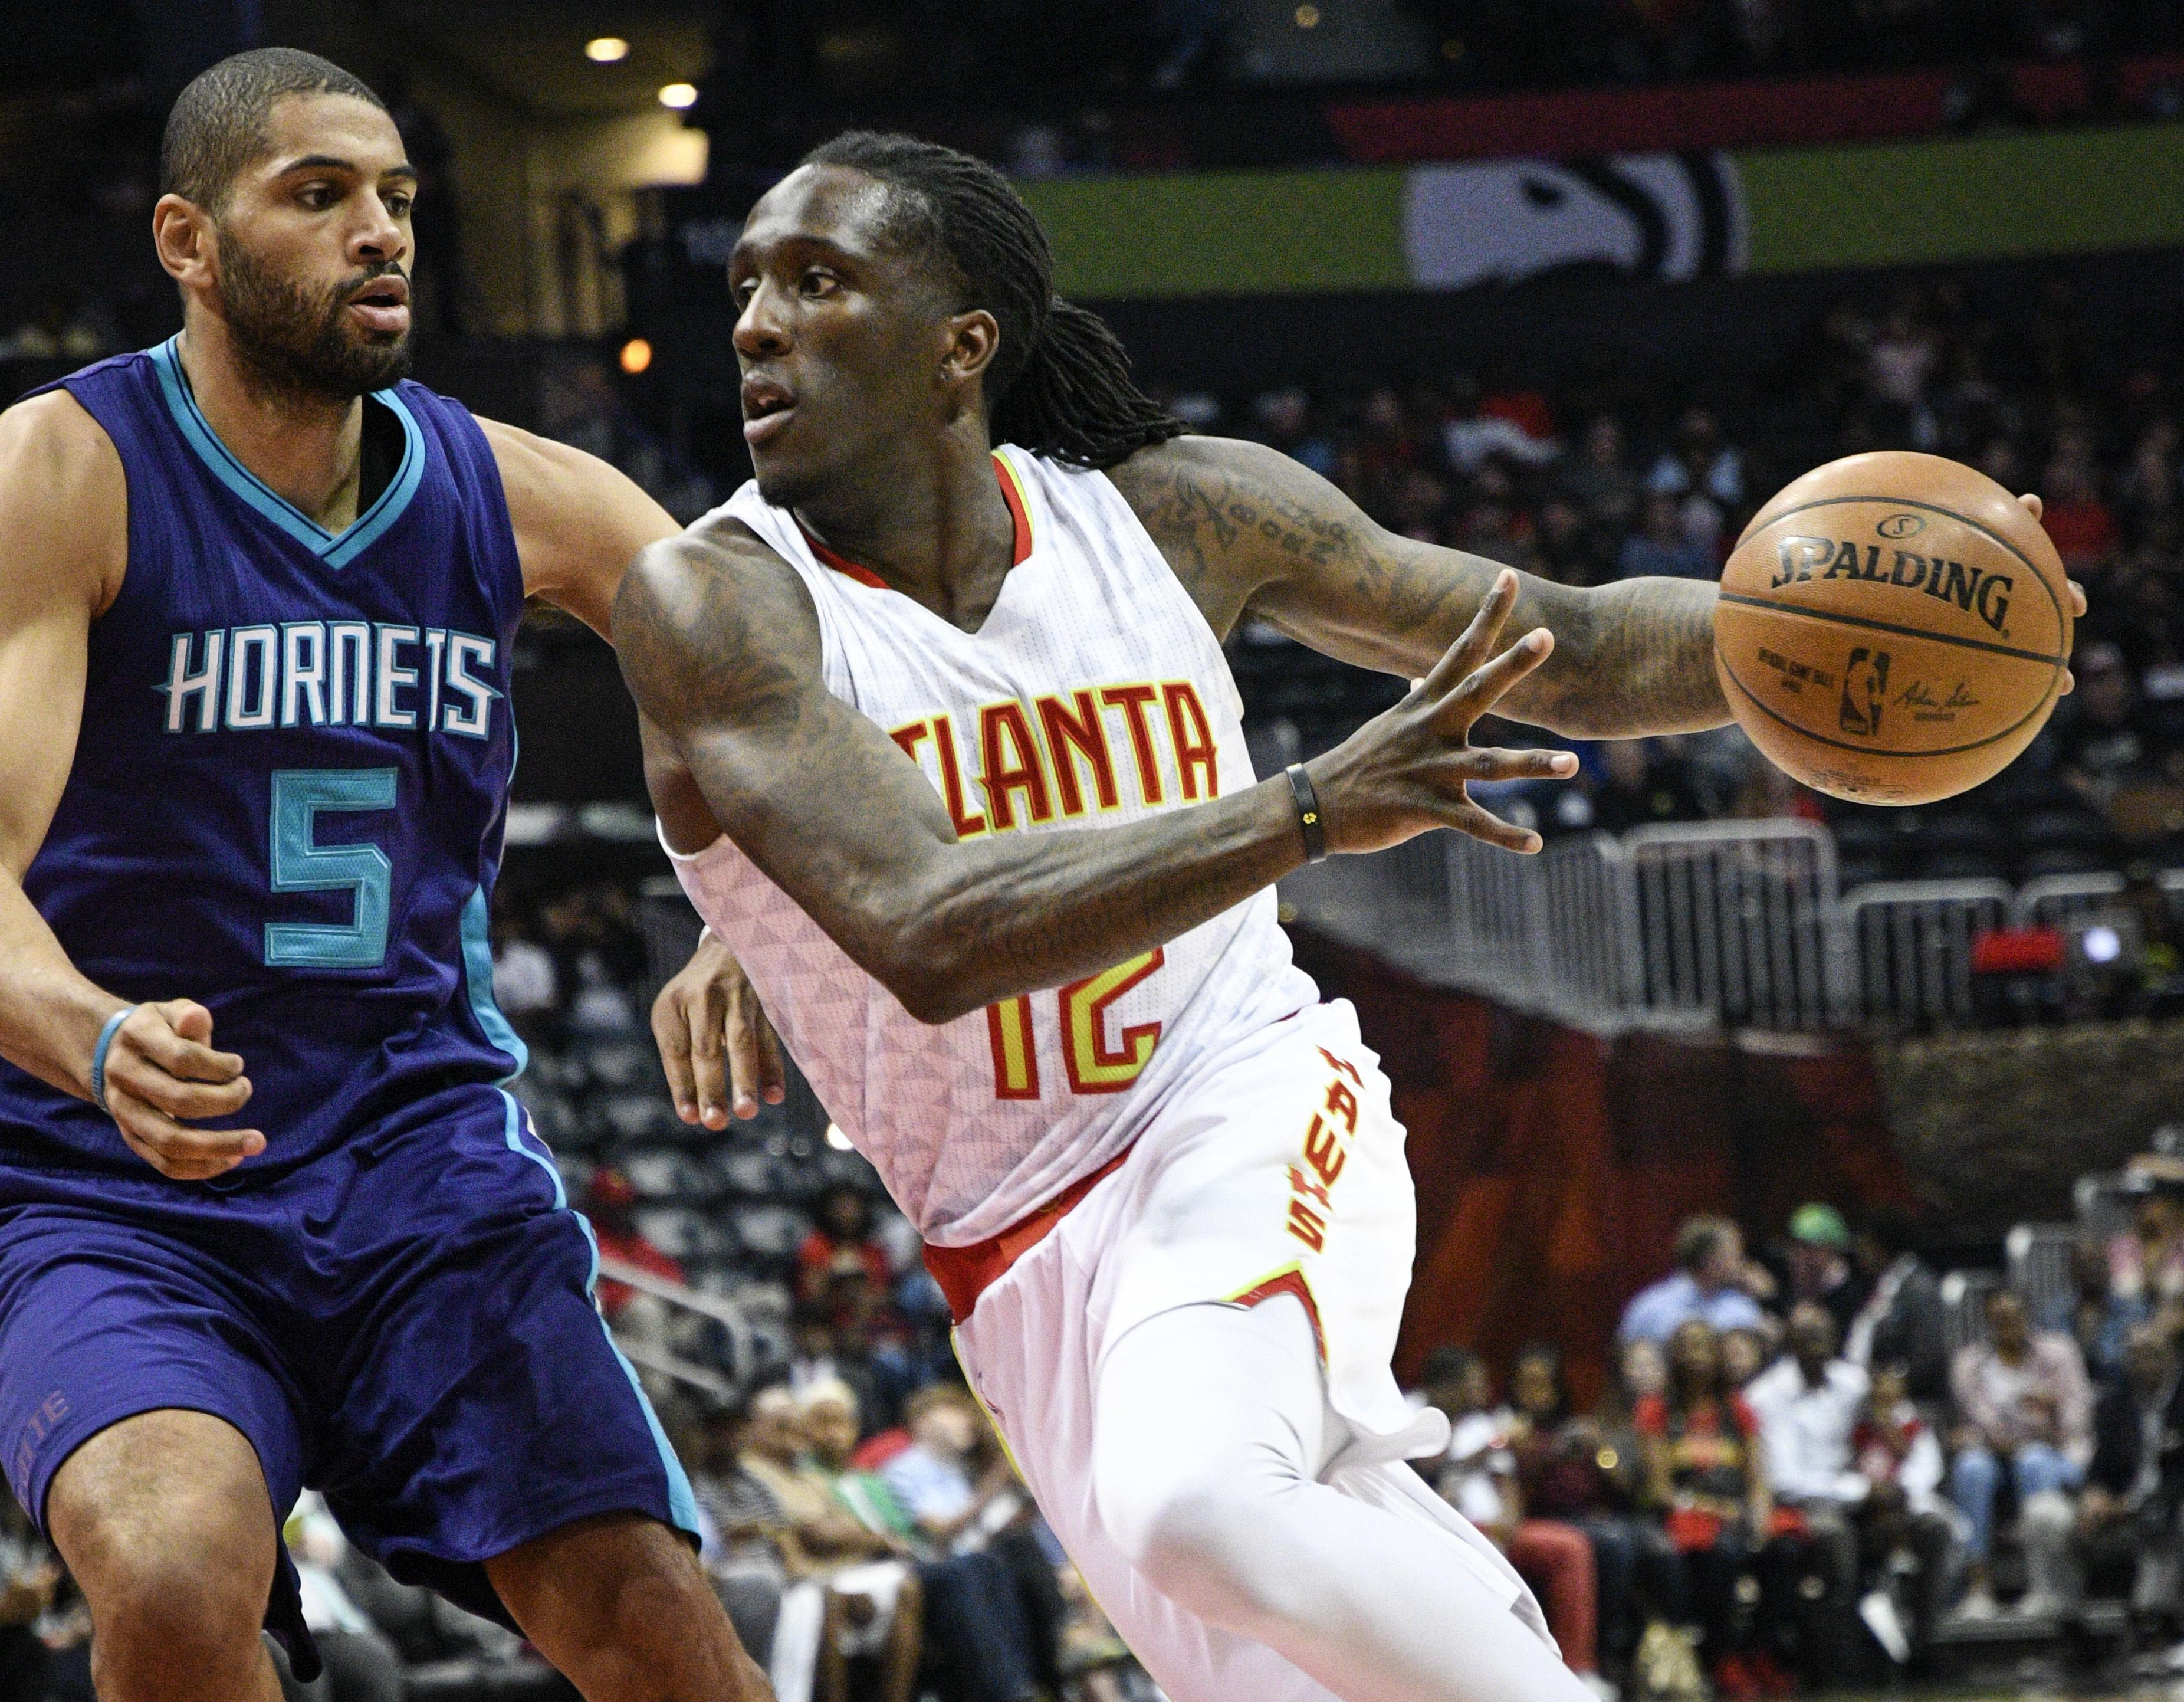 Hornets_hawks_basketball_41156